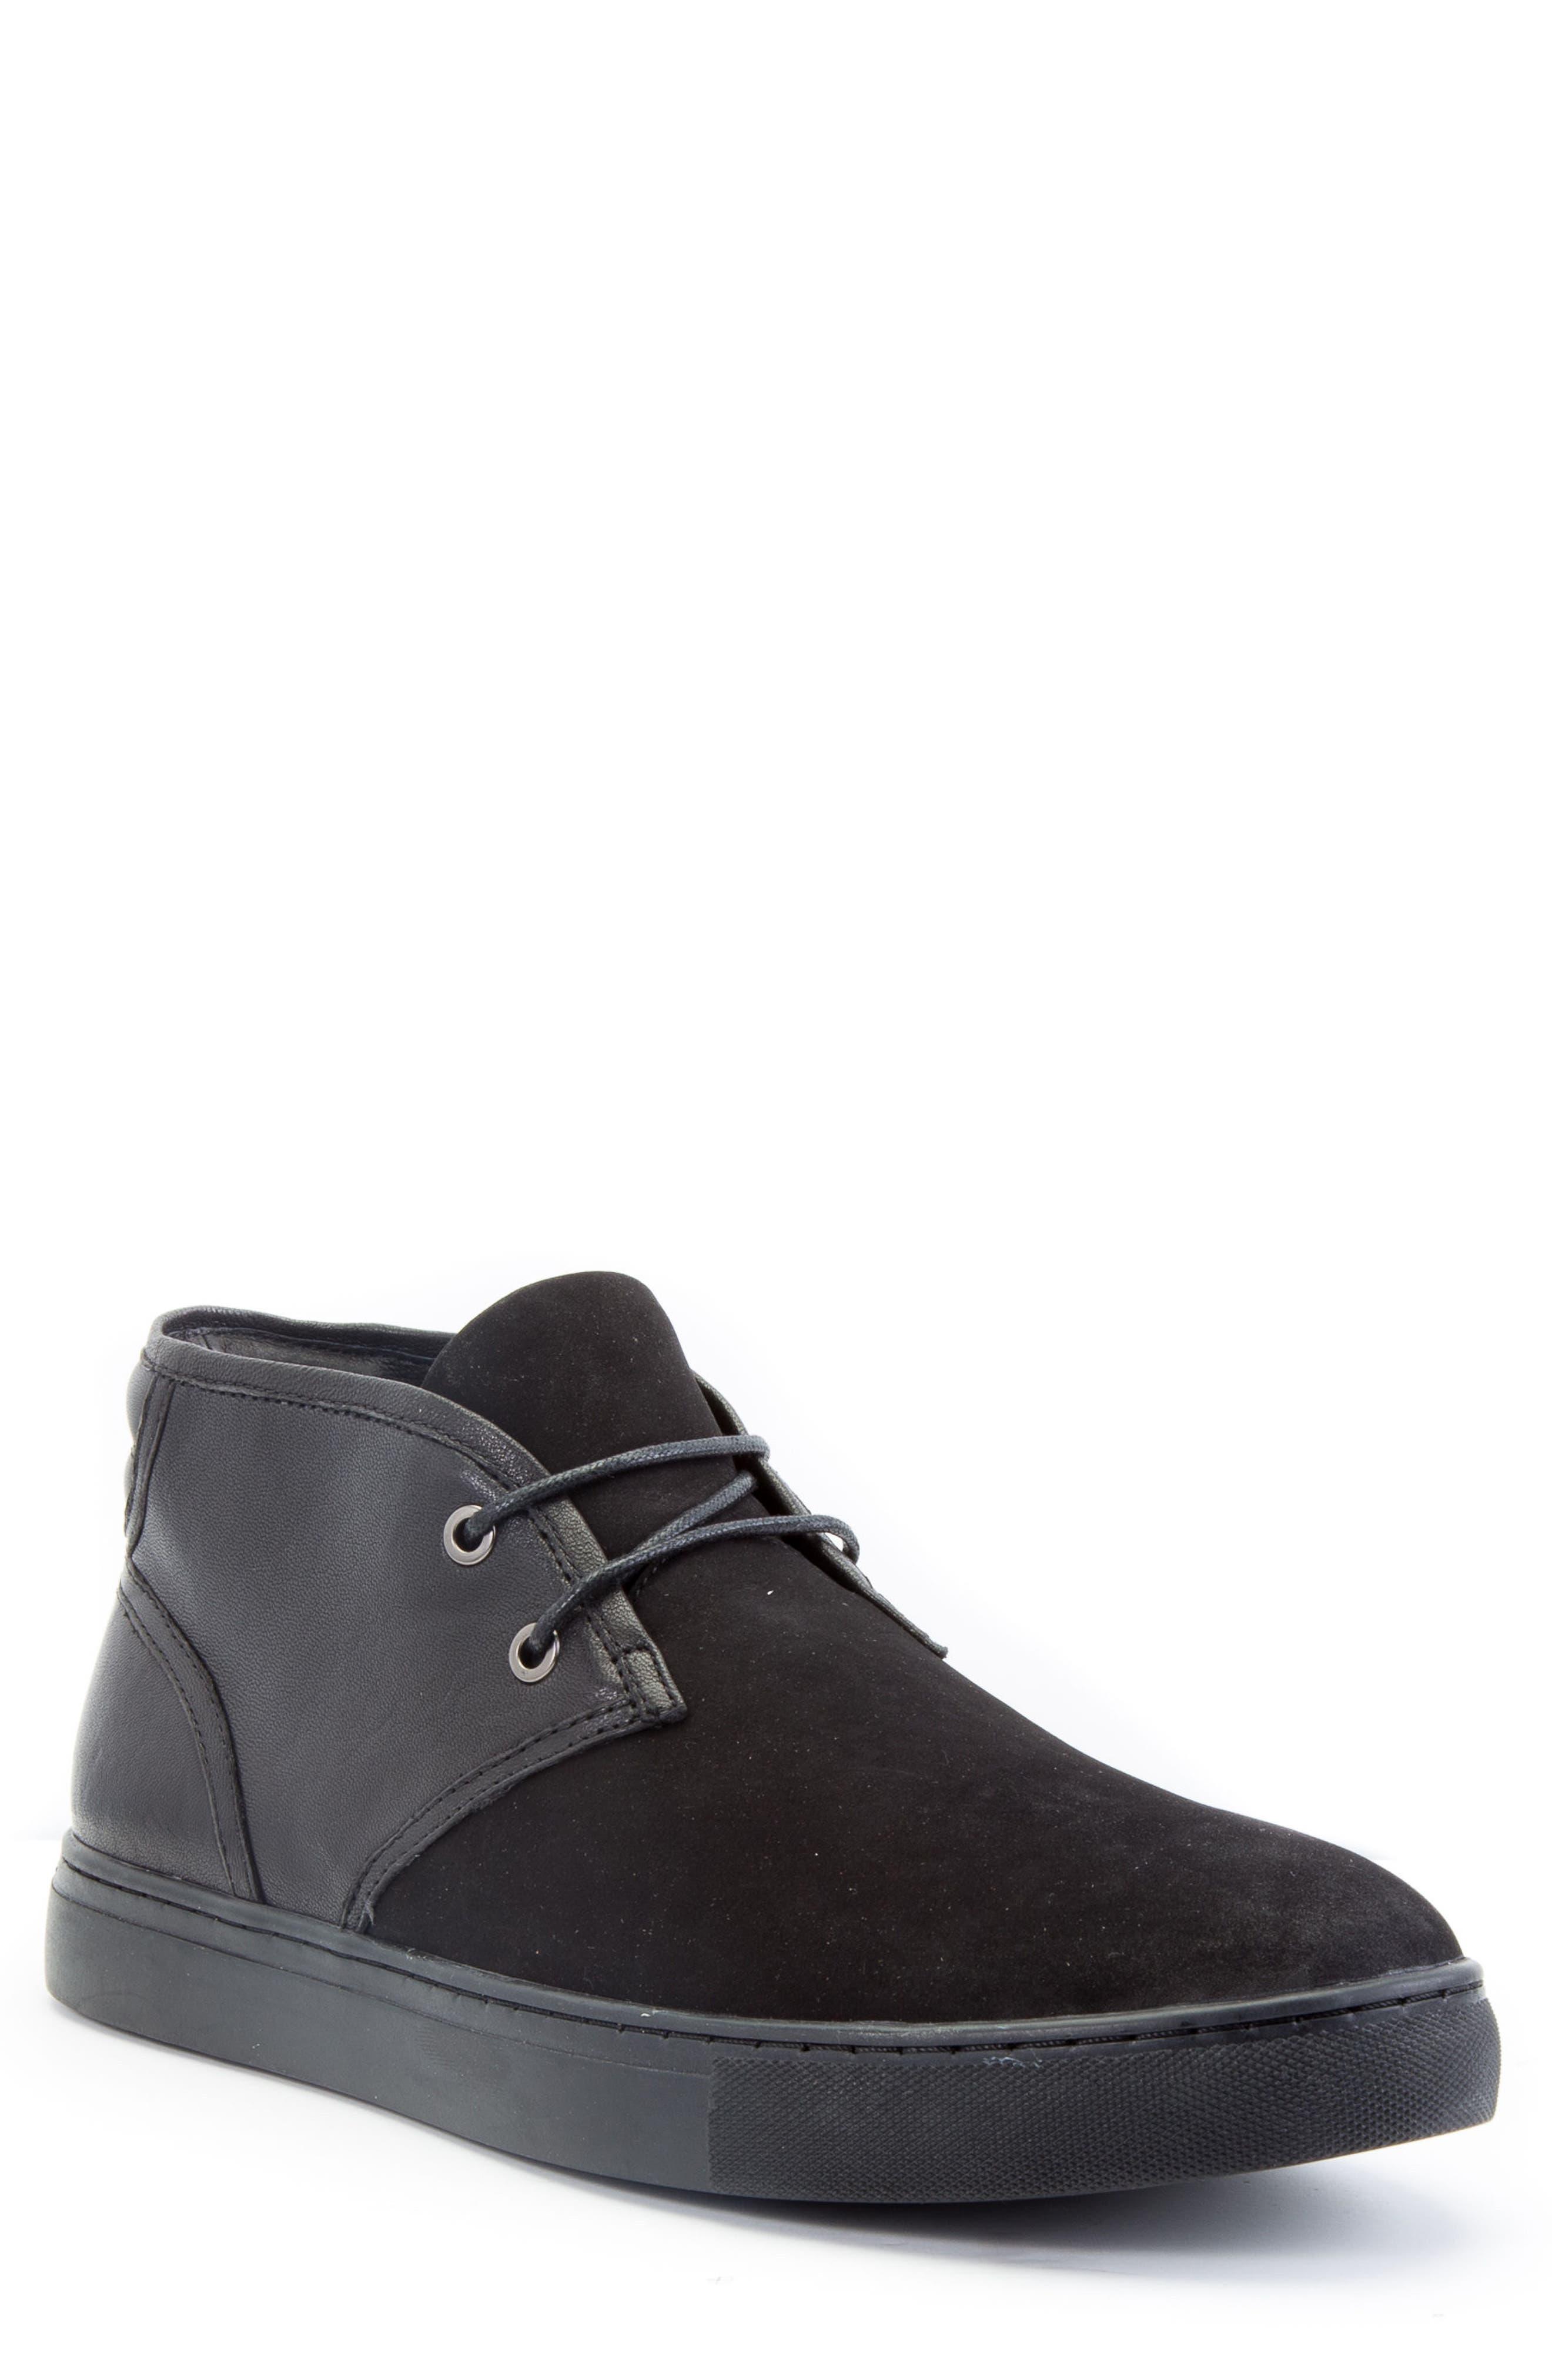 Catlett Chukka Sneaker,                         Main,                         color, 001